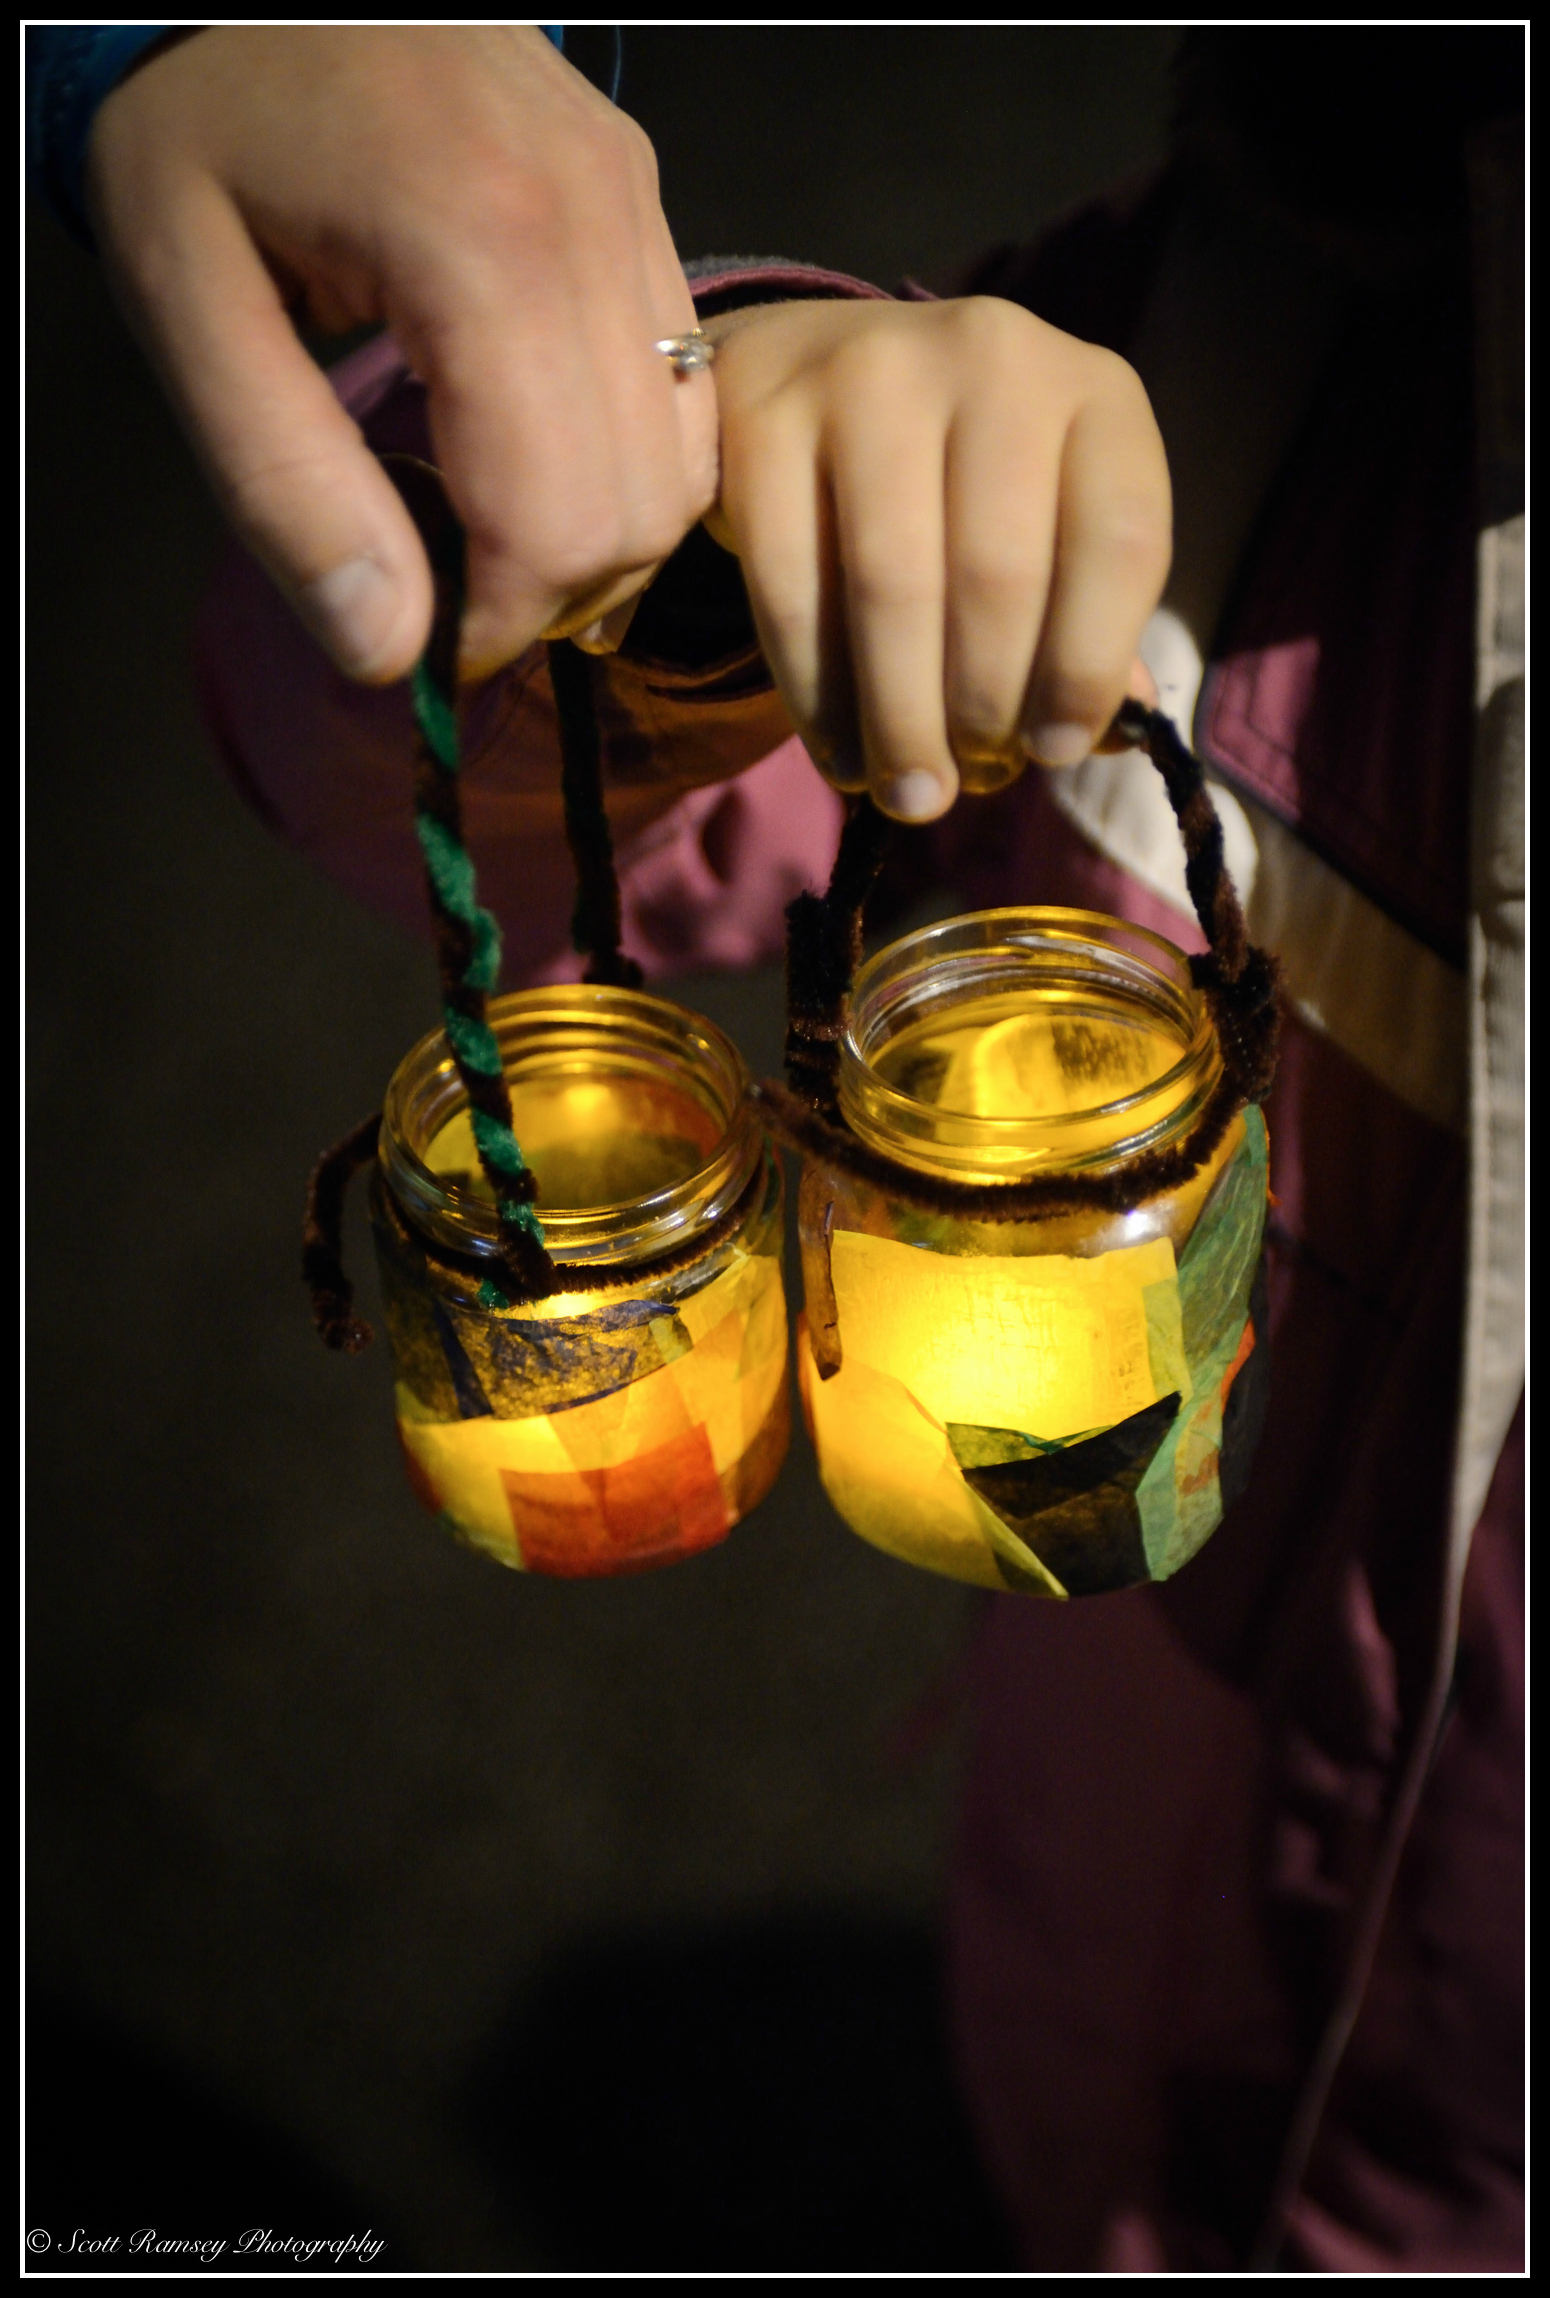 Children's lanterns help light the dark night during the East Preston VillageChristmas celebrations.